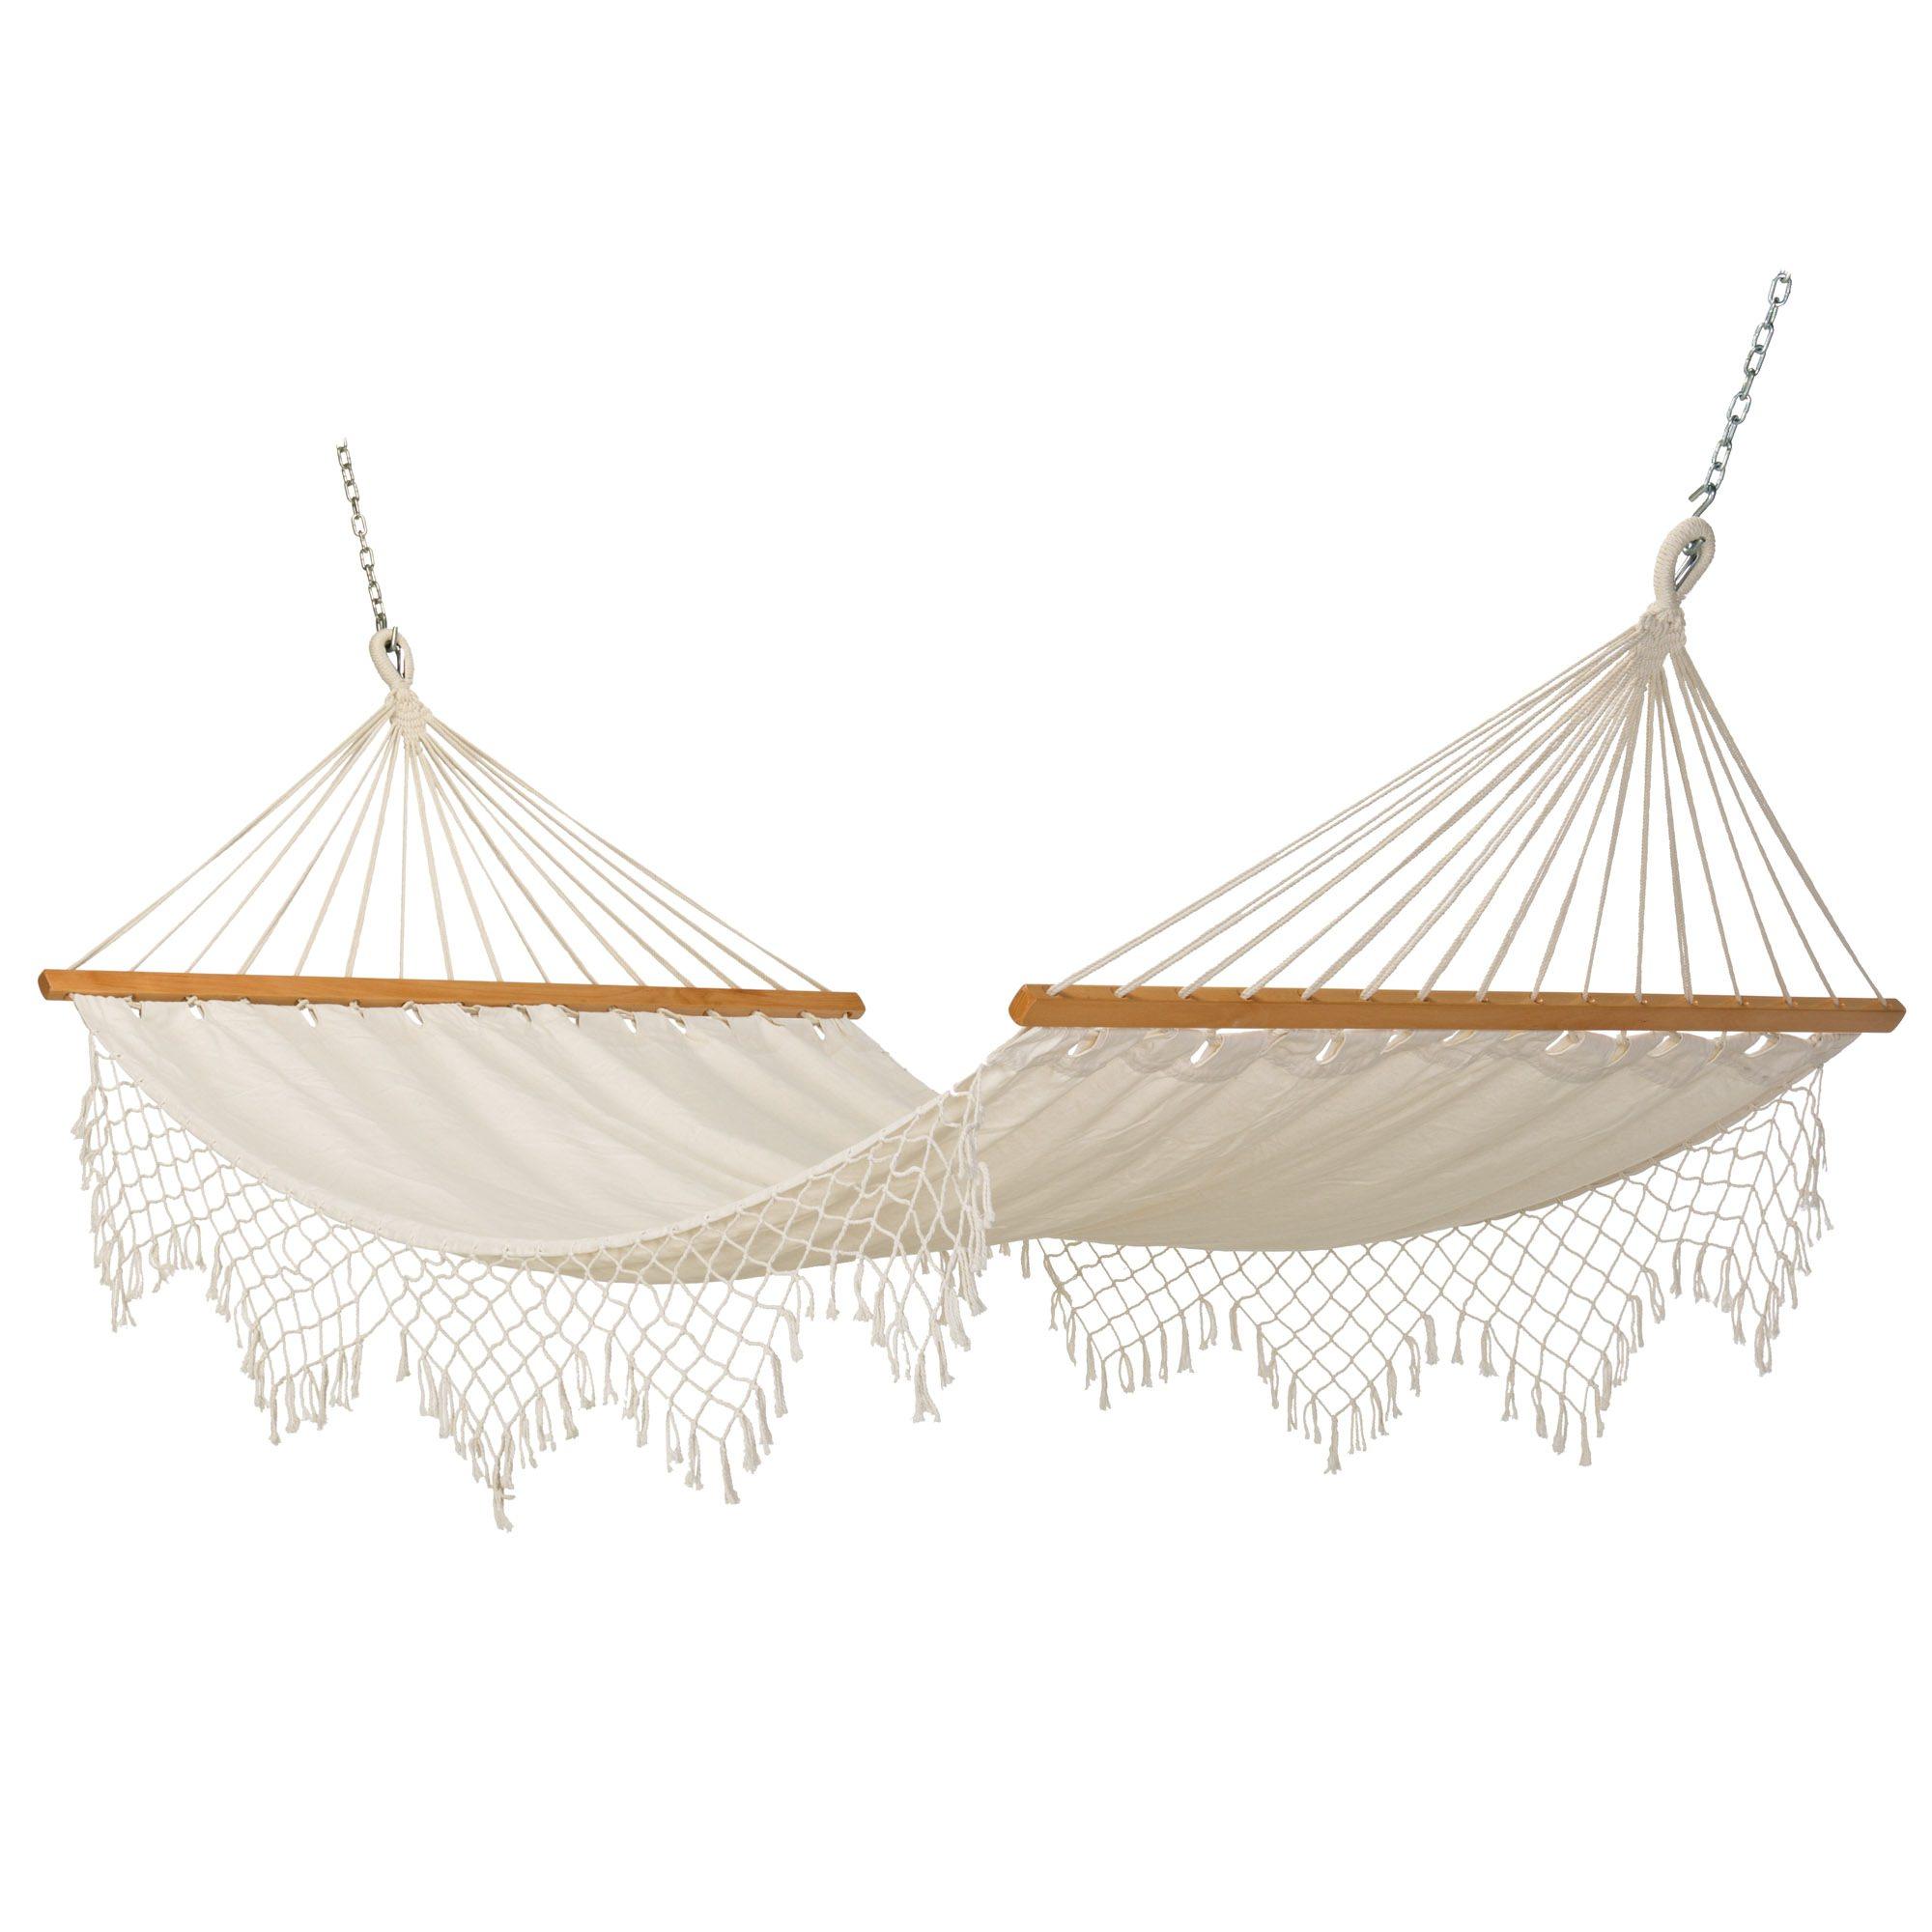 capri canvas hammock with fringe capri canvas hammock with fringe castaway hammocks     dfohome  rh   dfohome